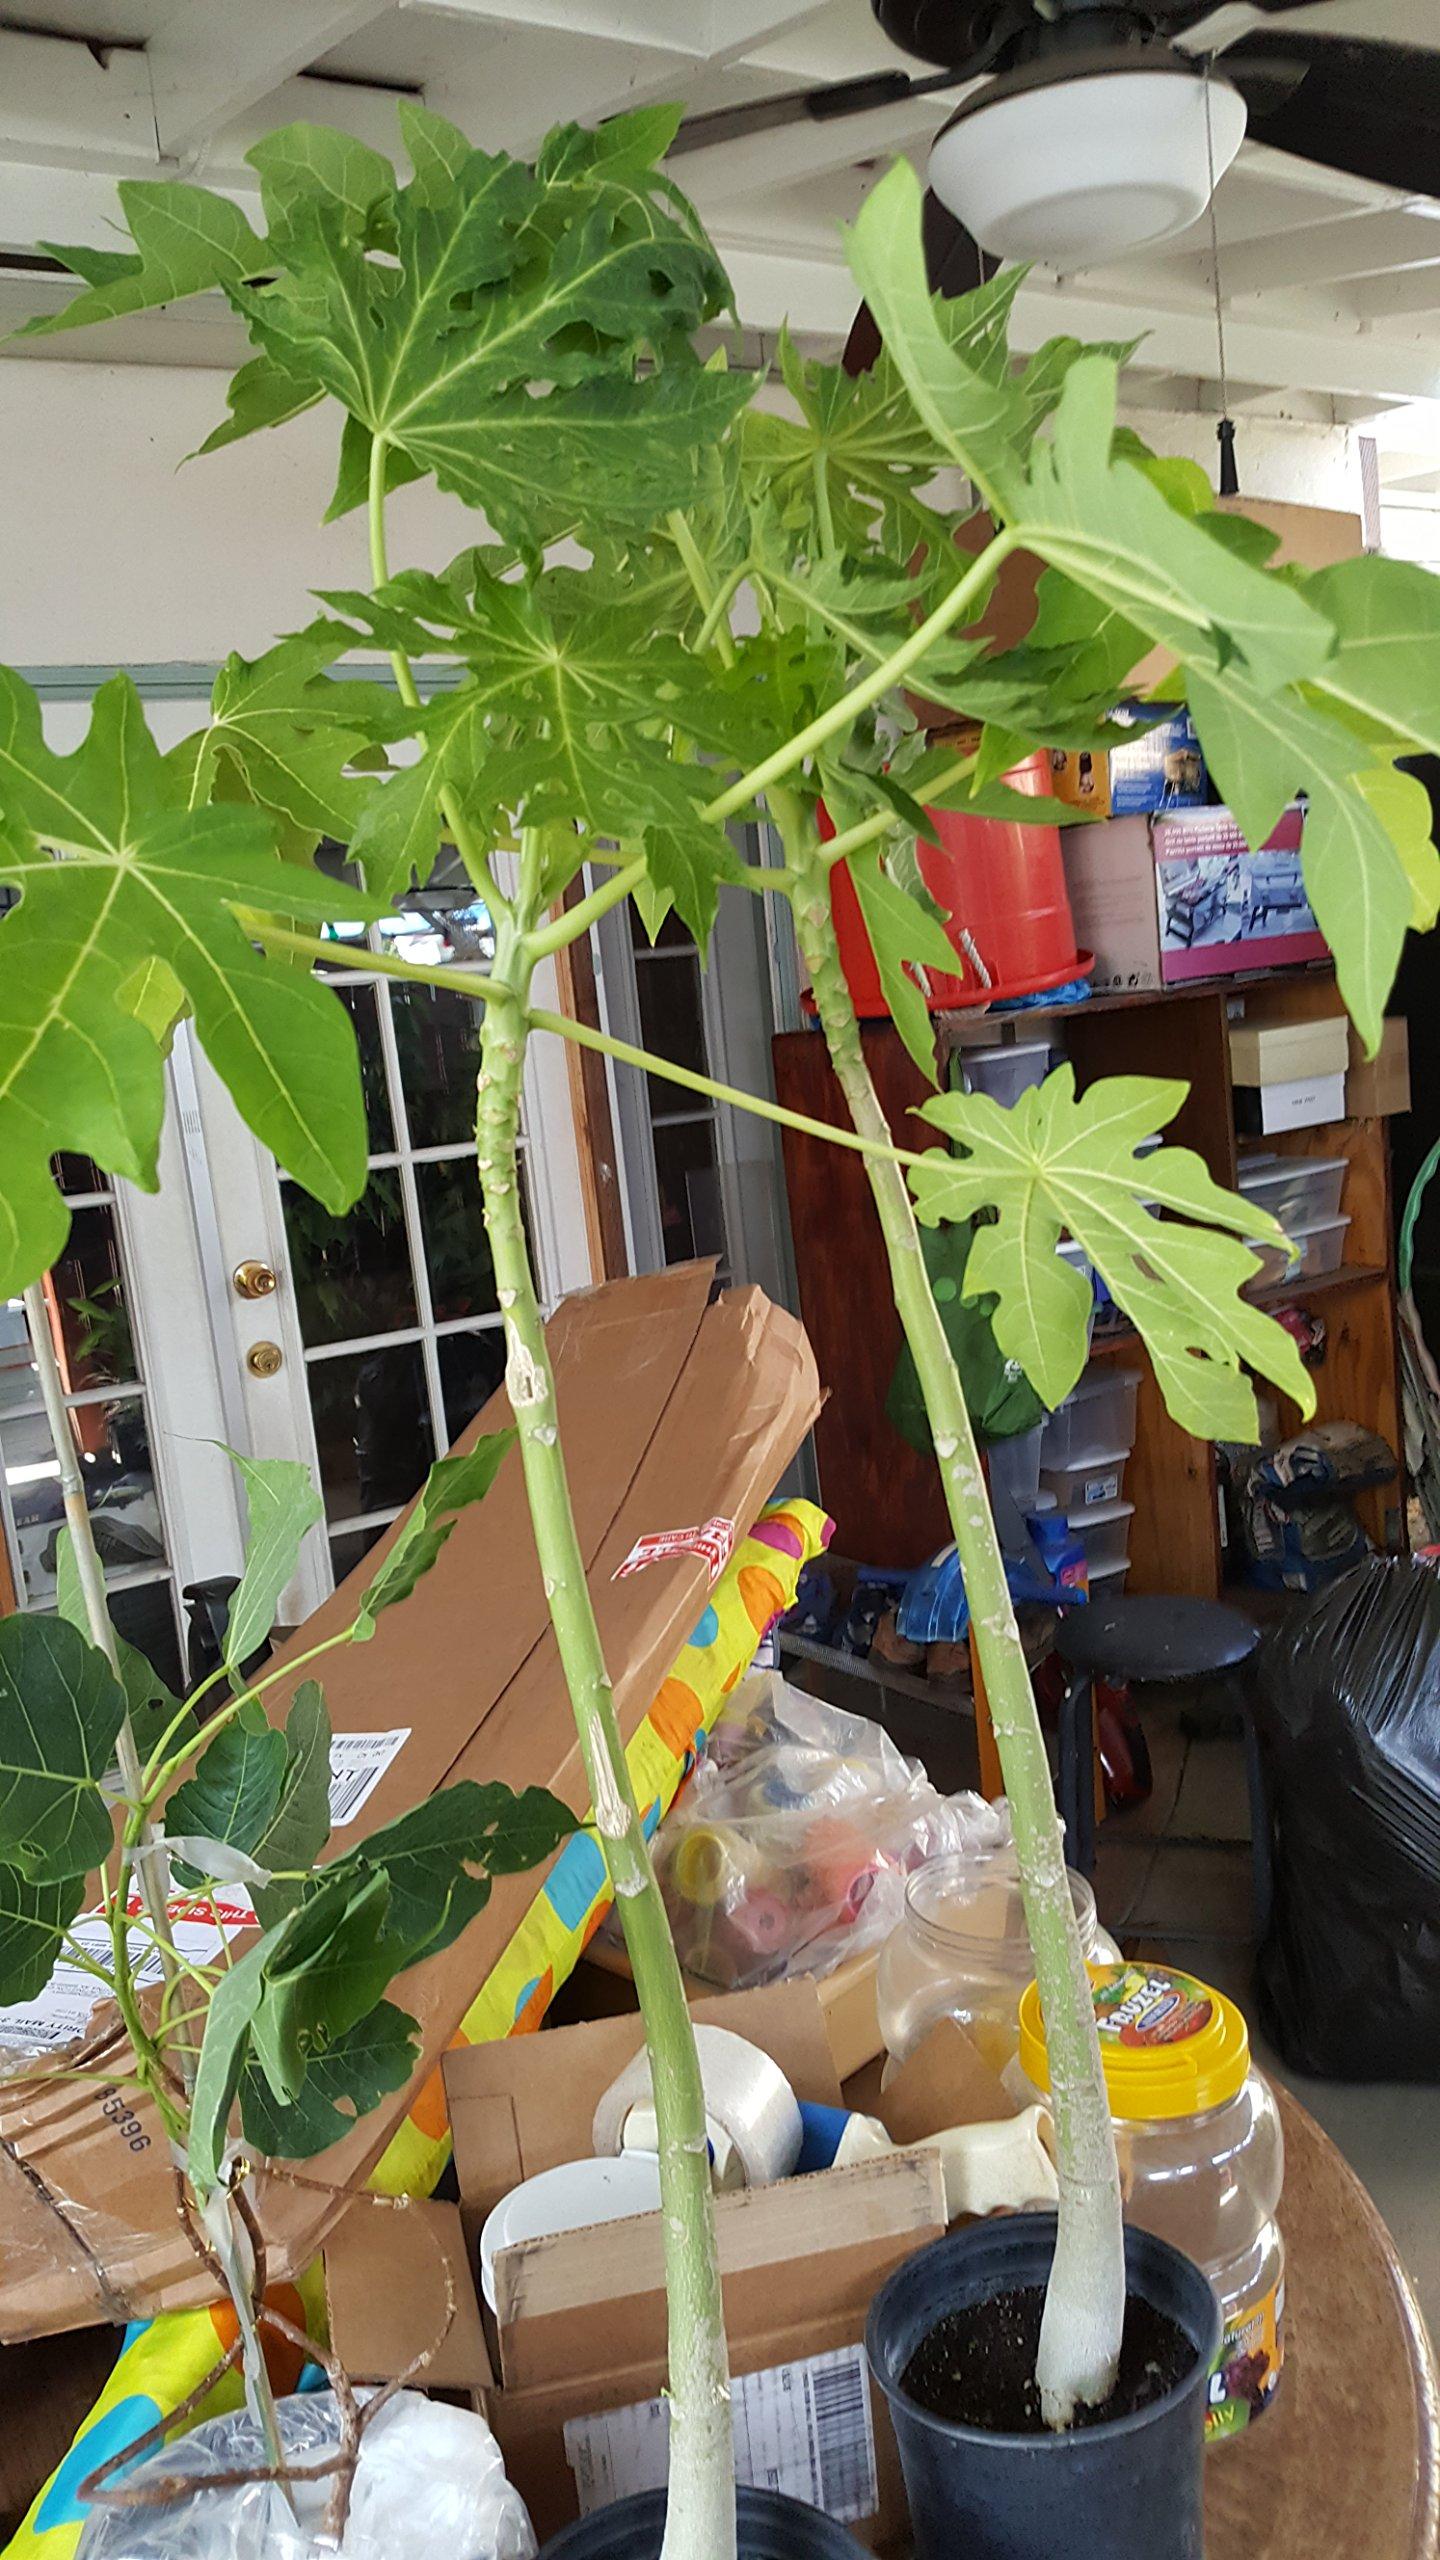 9EzTropical - Hawaii Solo Papaya - Great Fruit Tree - 1 to 2 Feet Tall - Ship in 1 Gal Pot